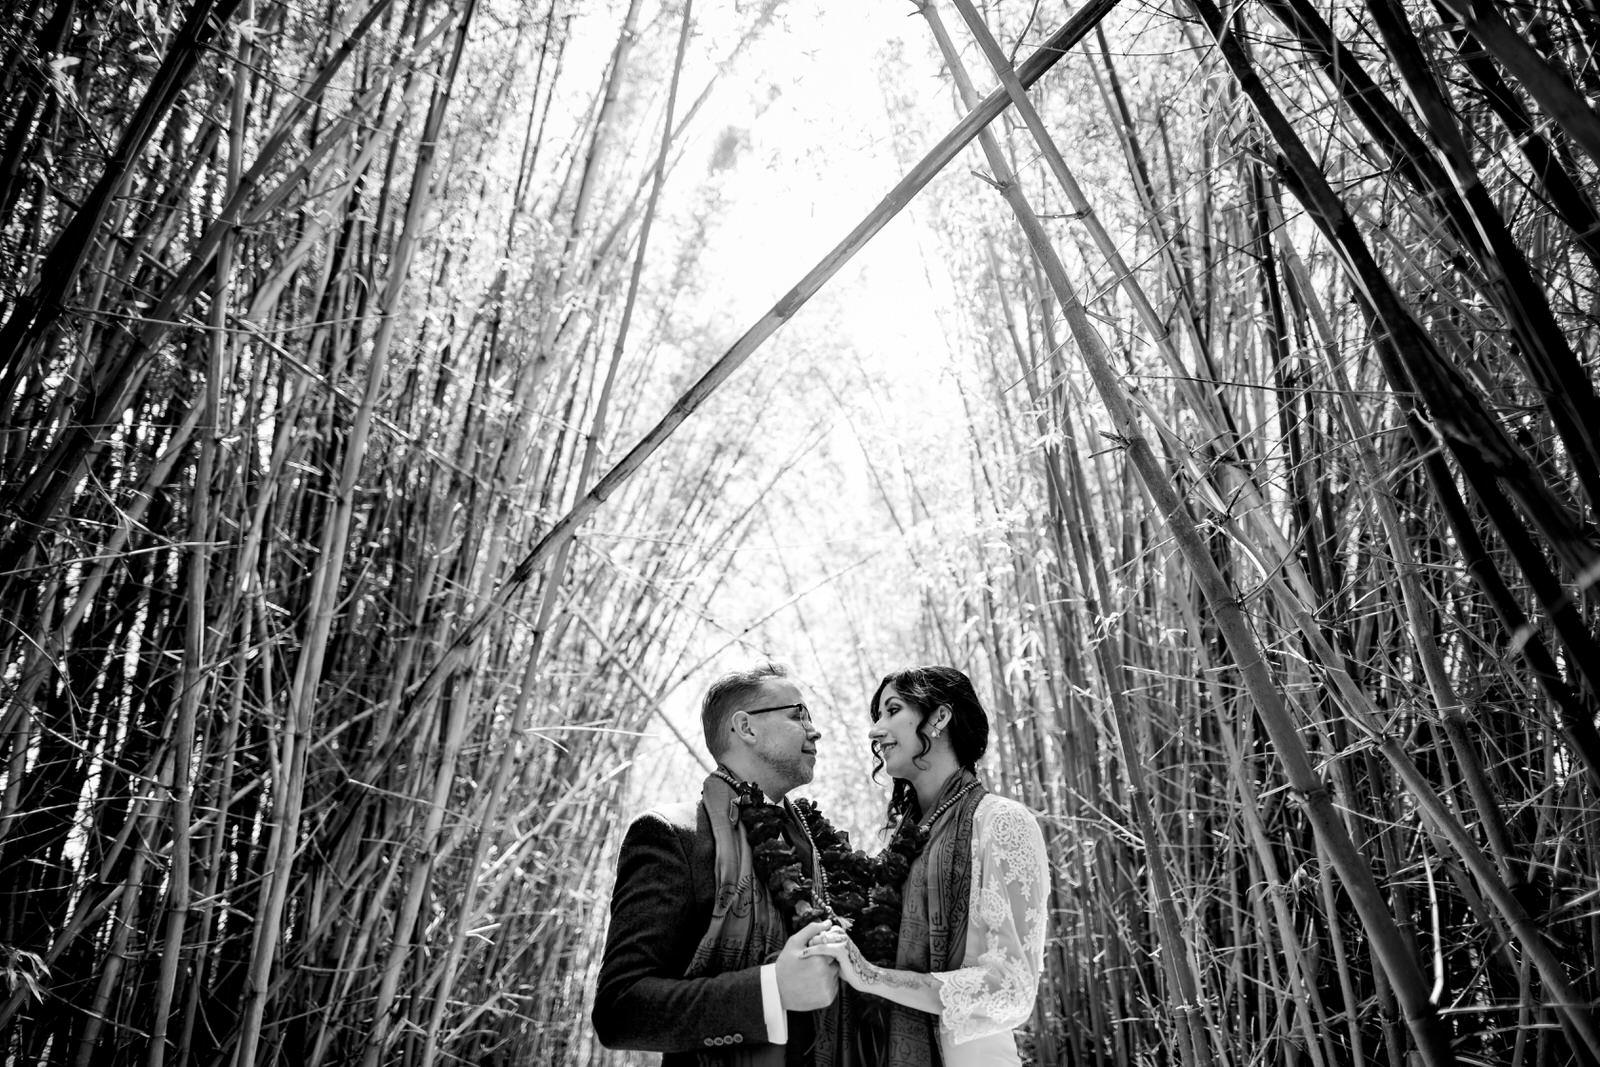 kashi-ashram-wedding-bride-and-groom-portraits-tiny-house-photo-9.jpg